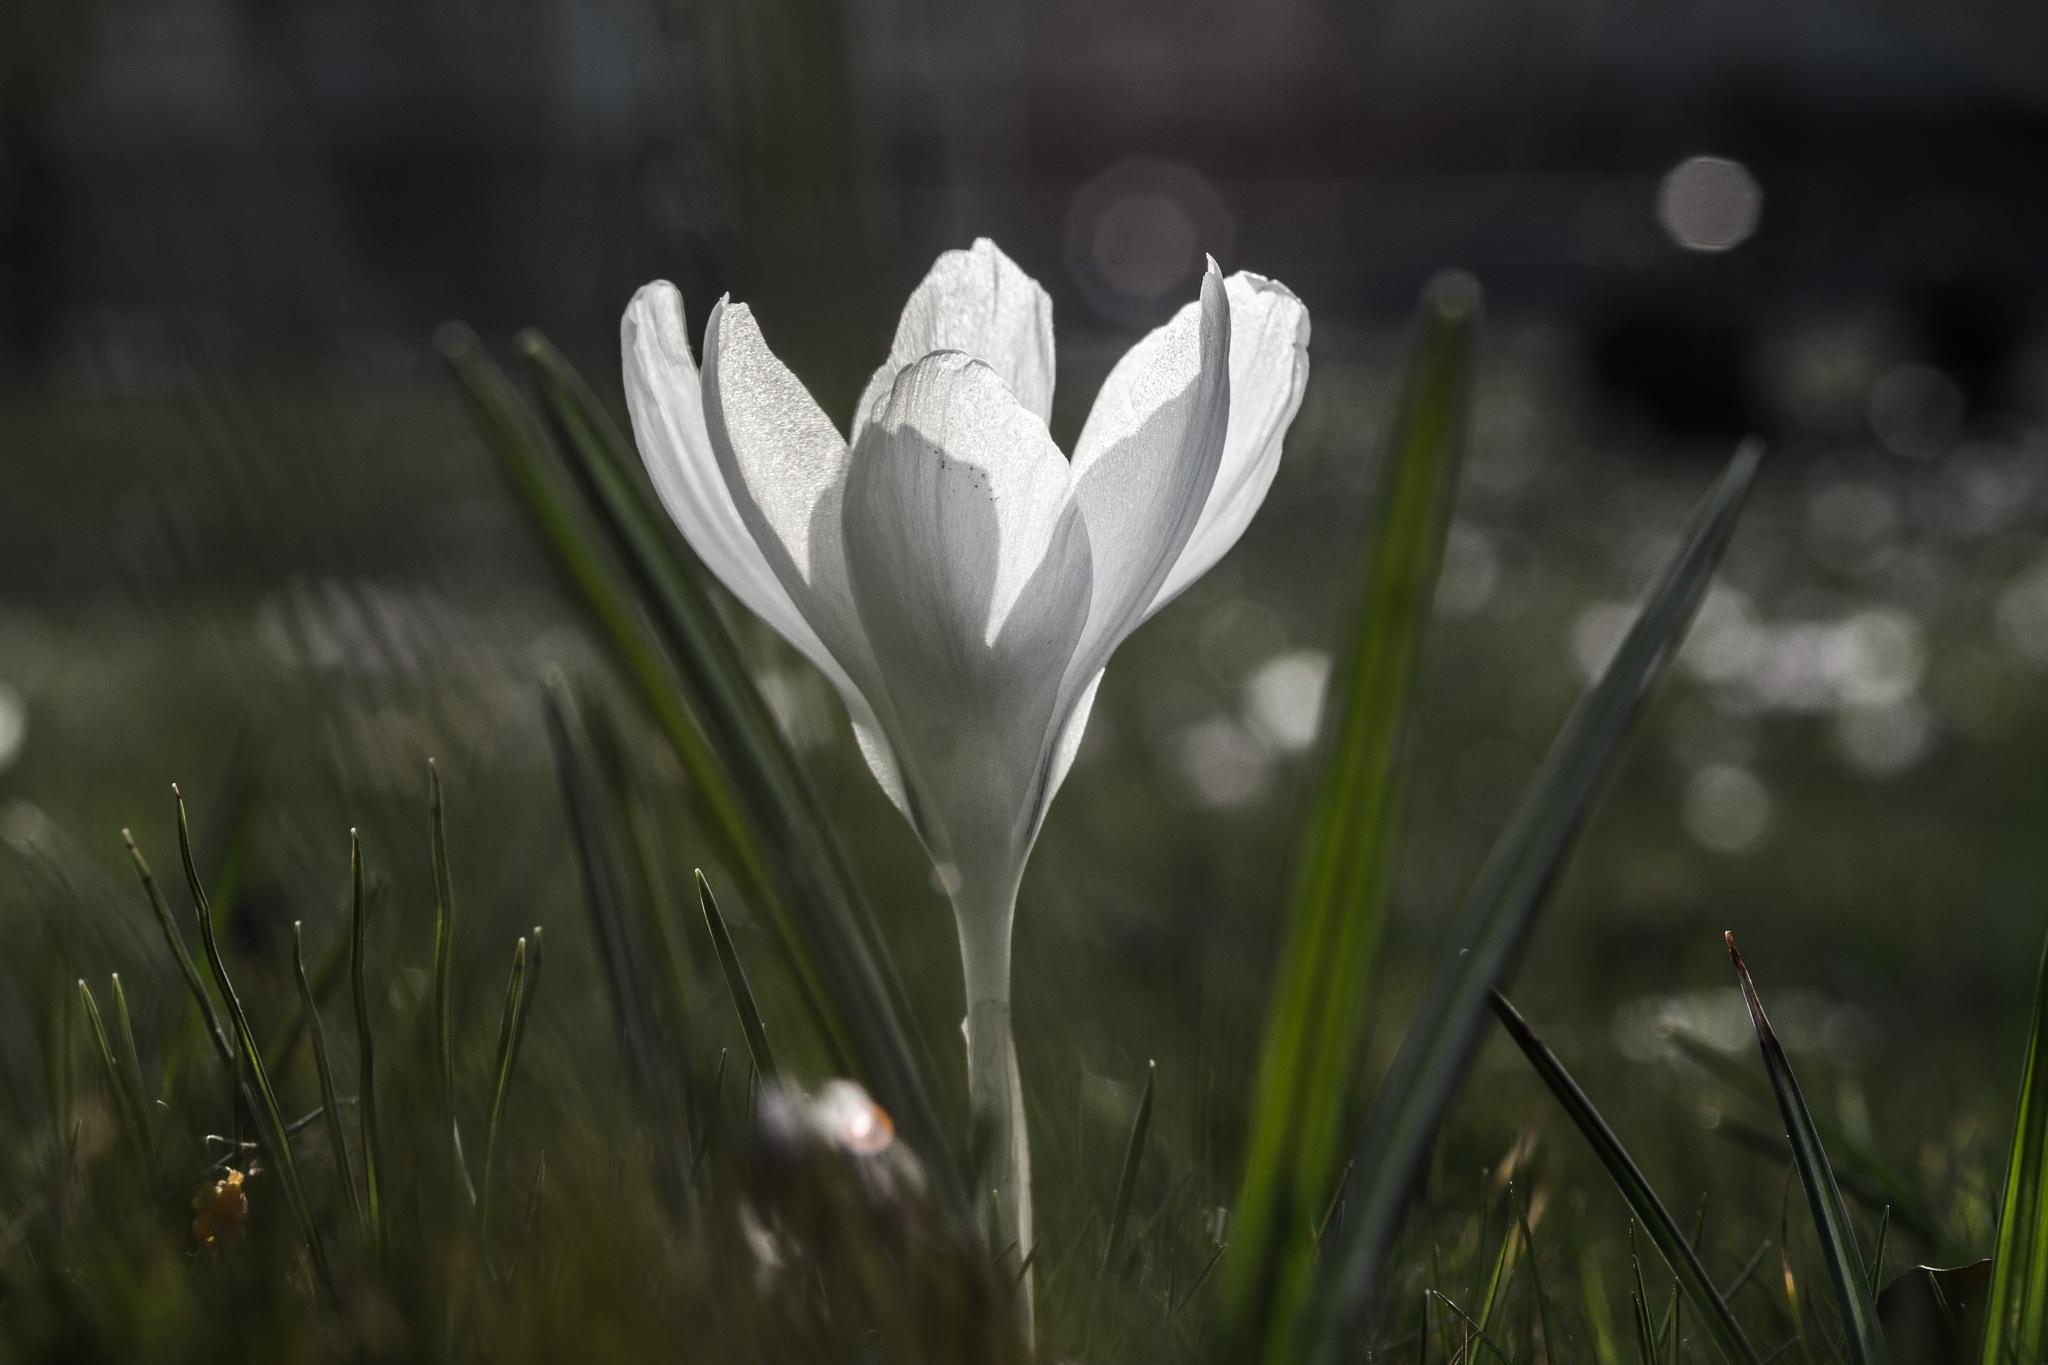 white flower by DavidZisky